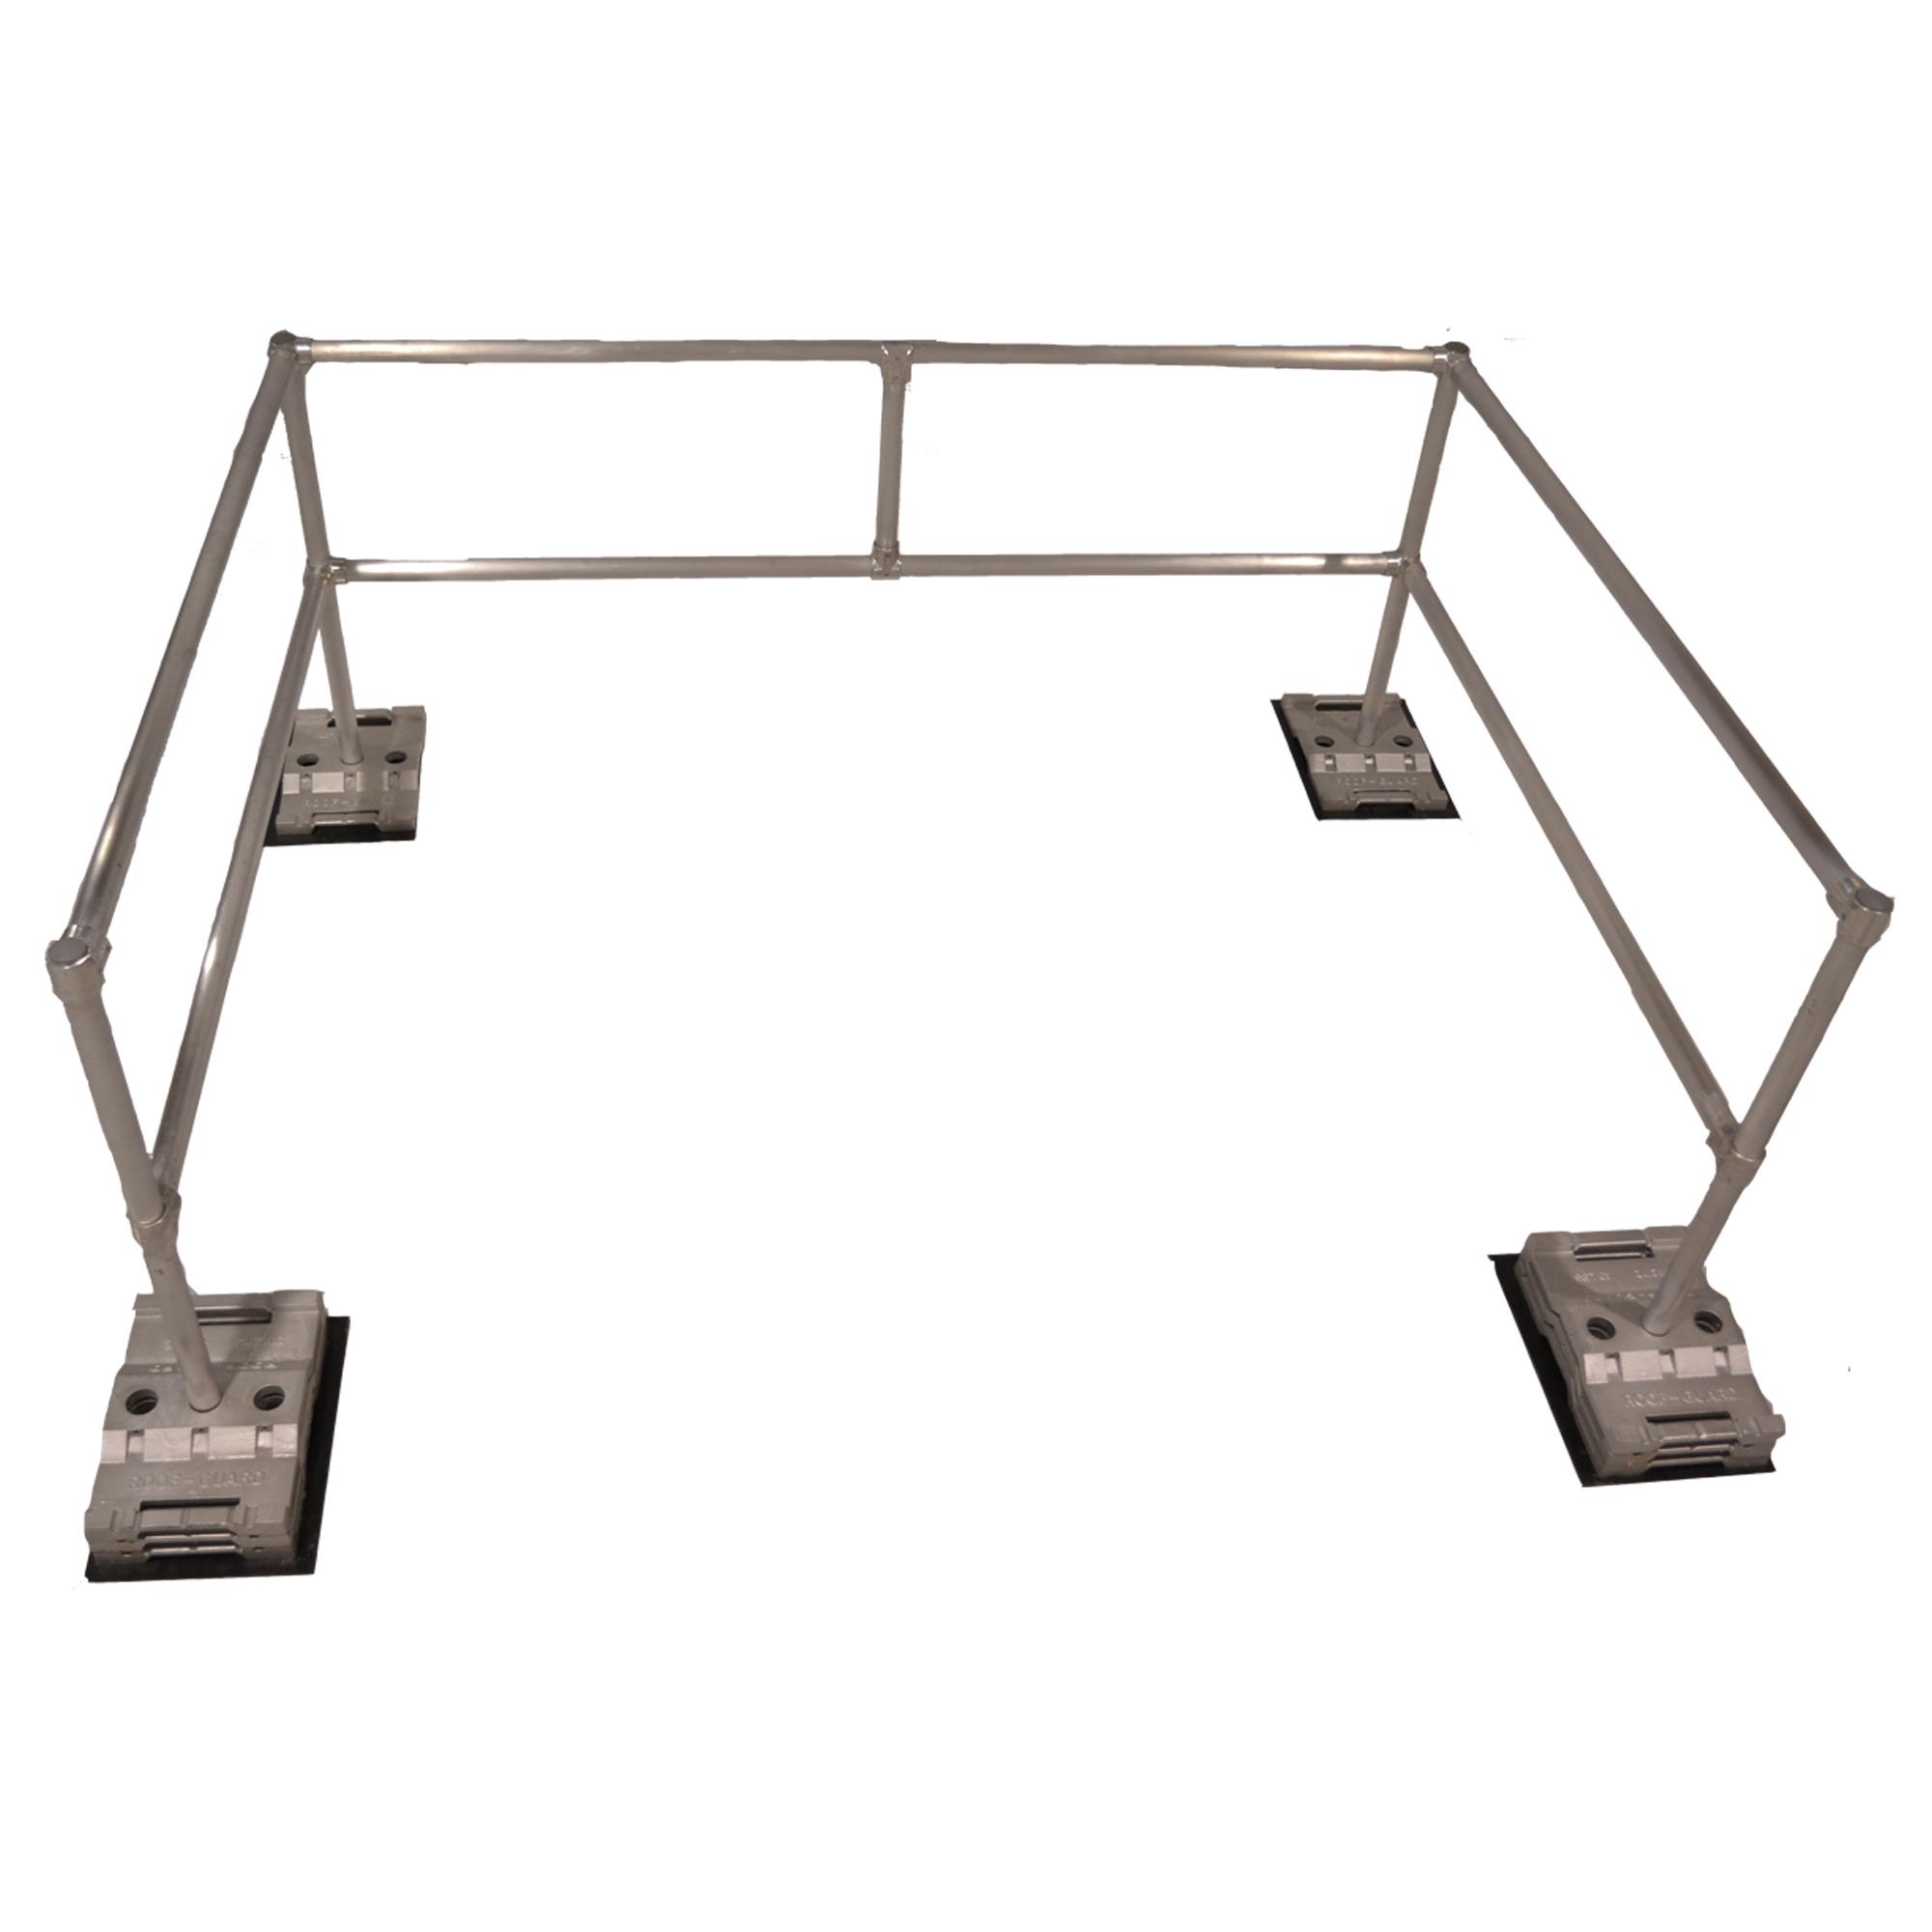 Rooftop Guardrail Kit